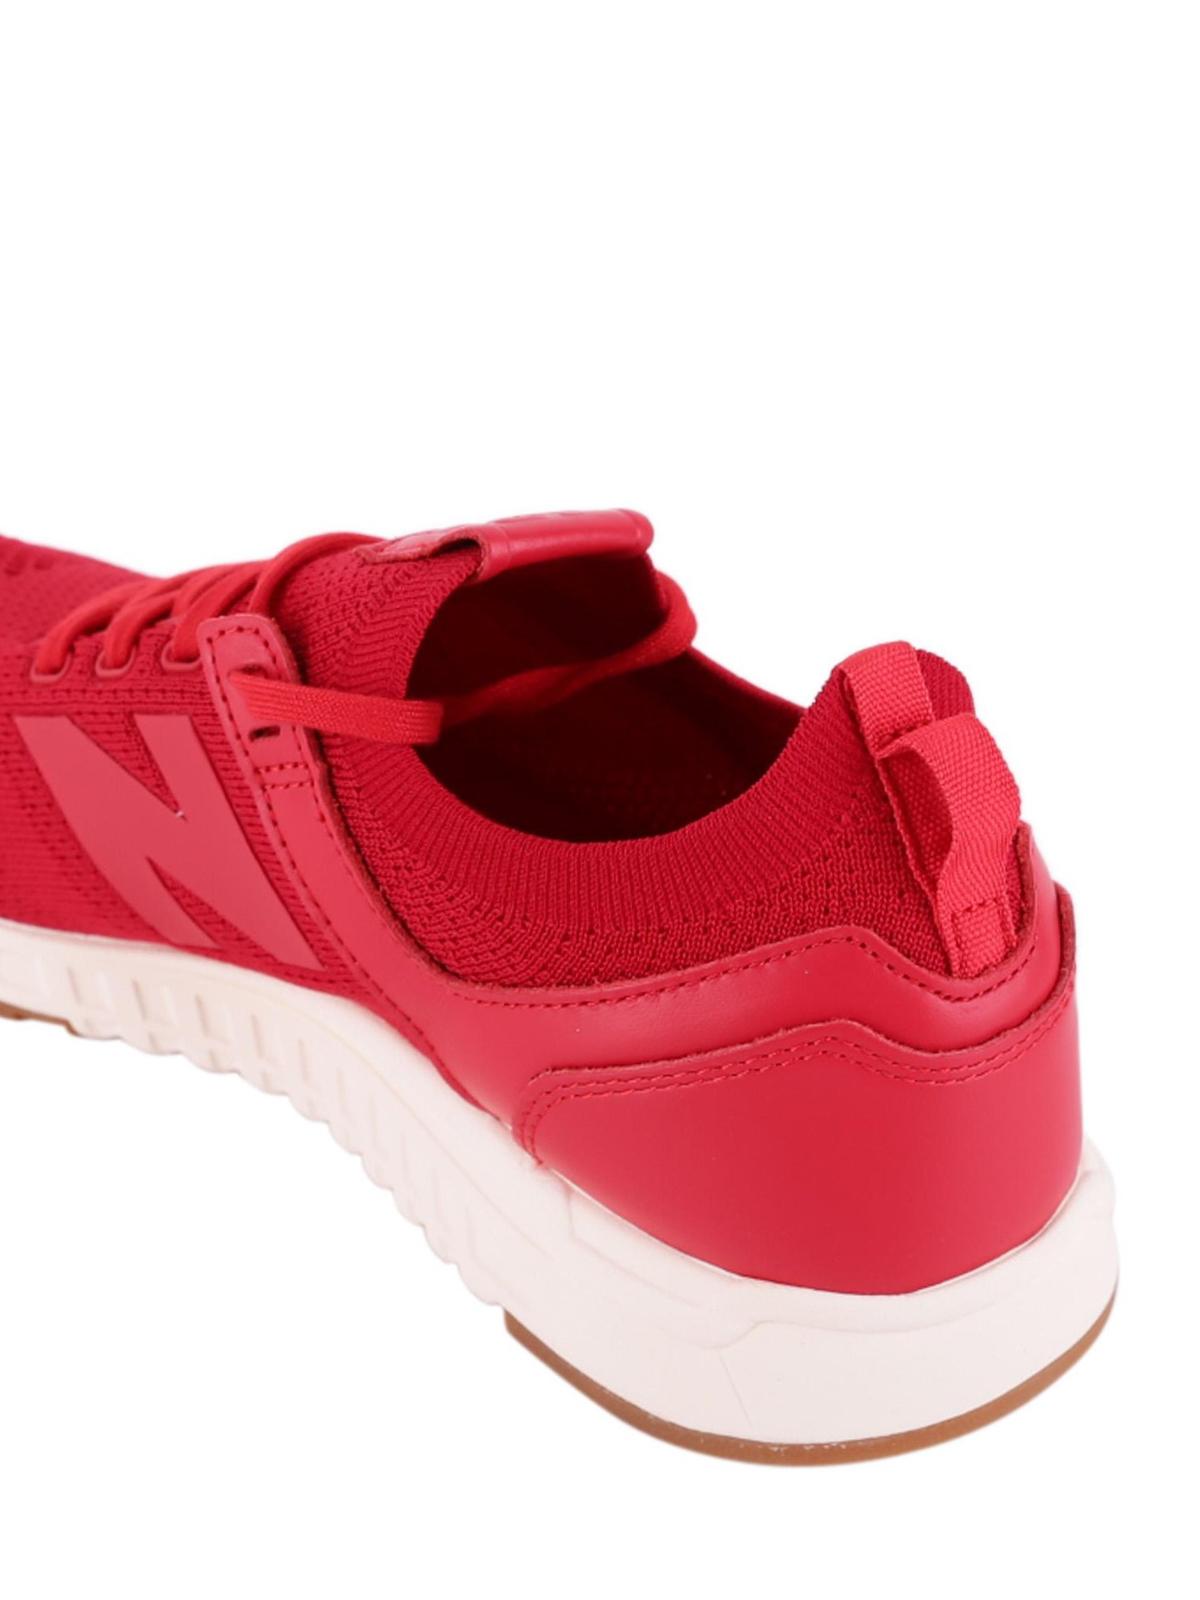 2047a1ac17 New Balance - Sneaker - Rot - Sneaker - MRL247DC | iKRIX Shop online